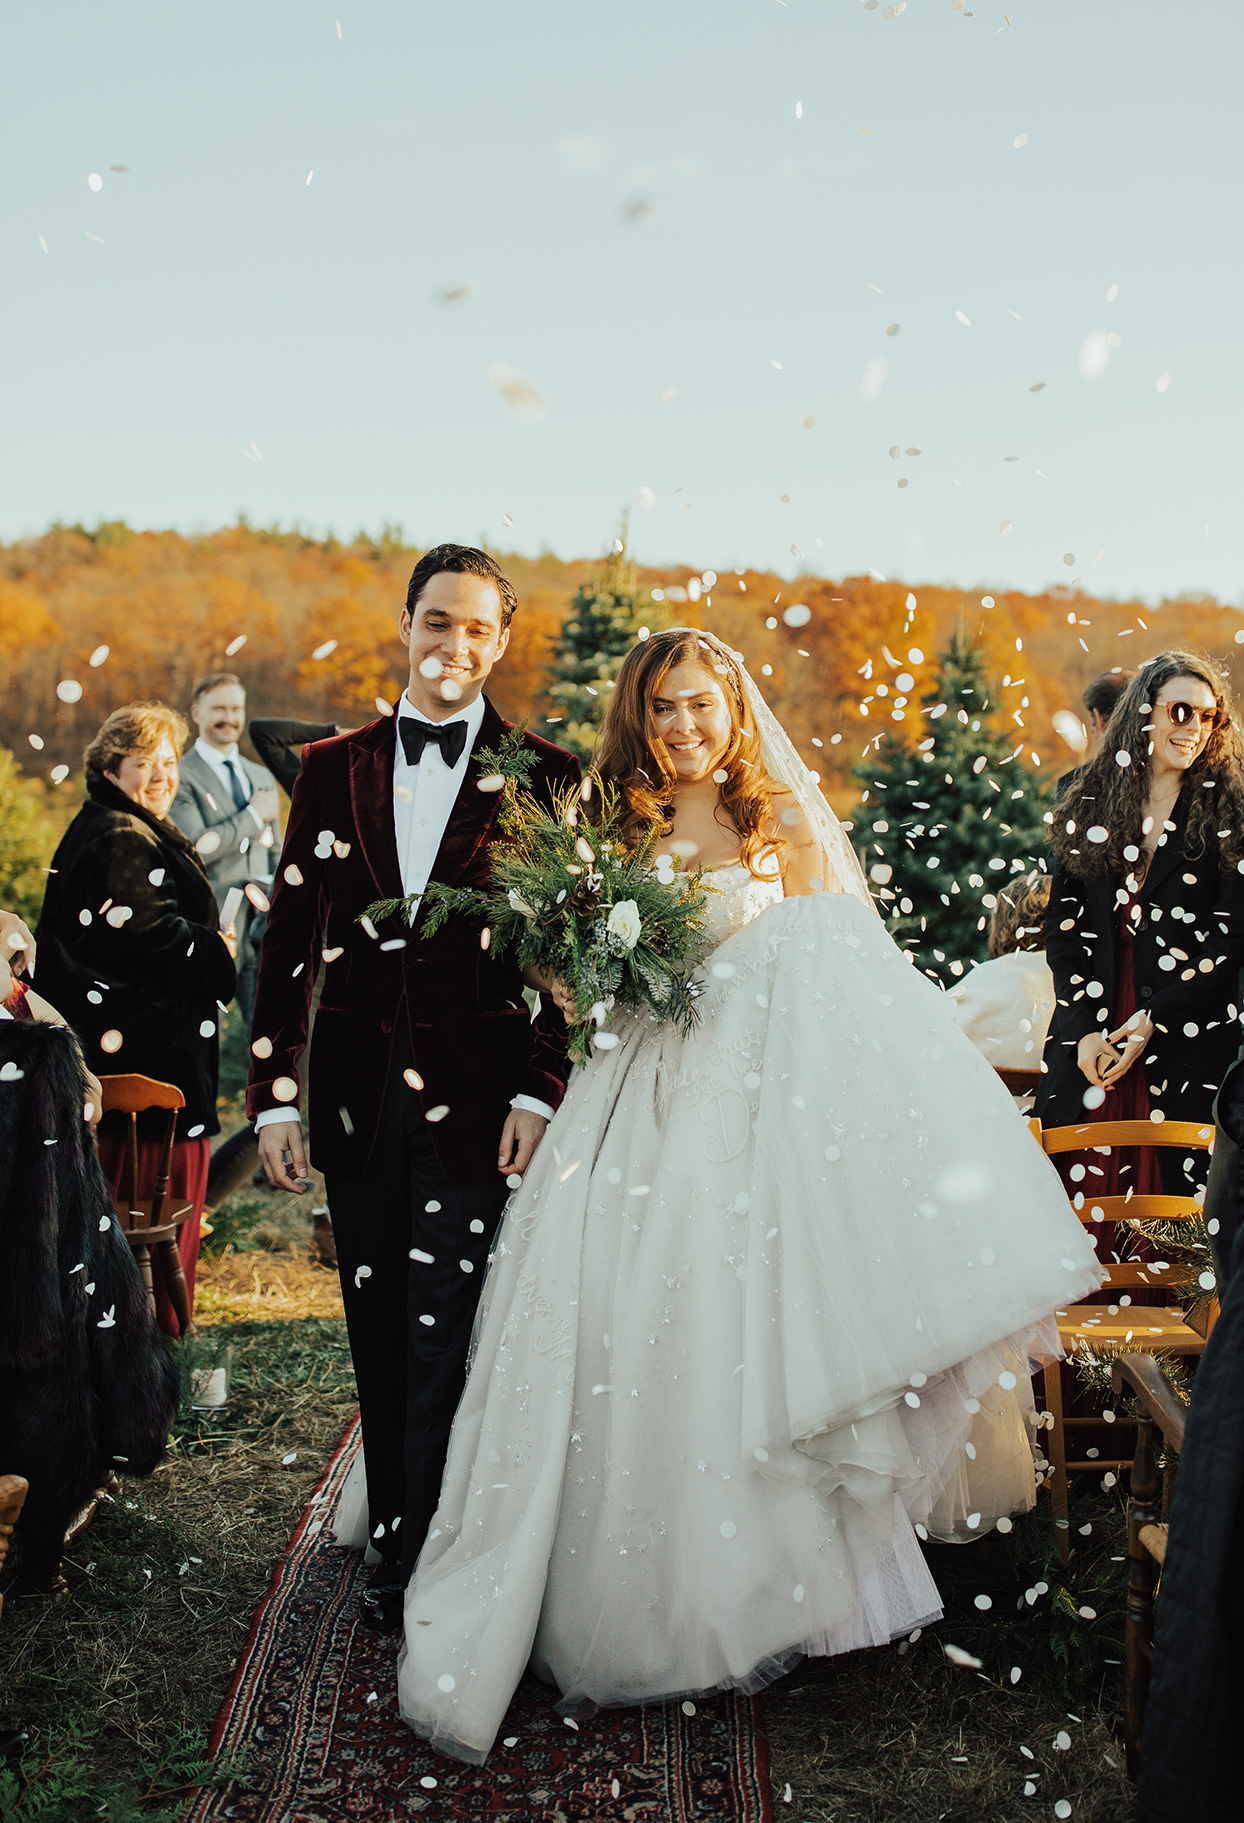 noelle danny wedding exit petals